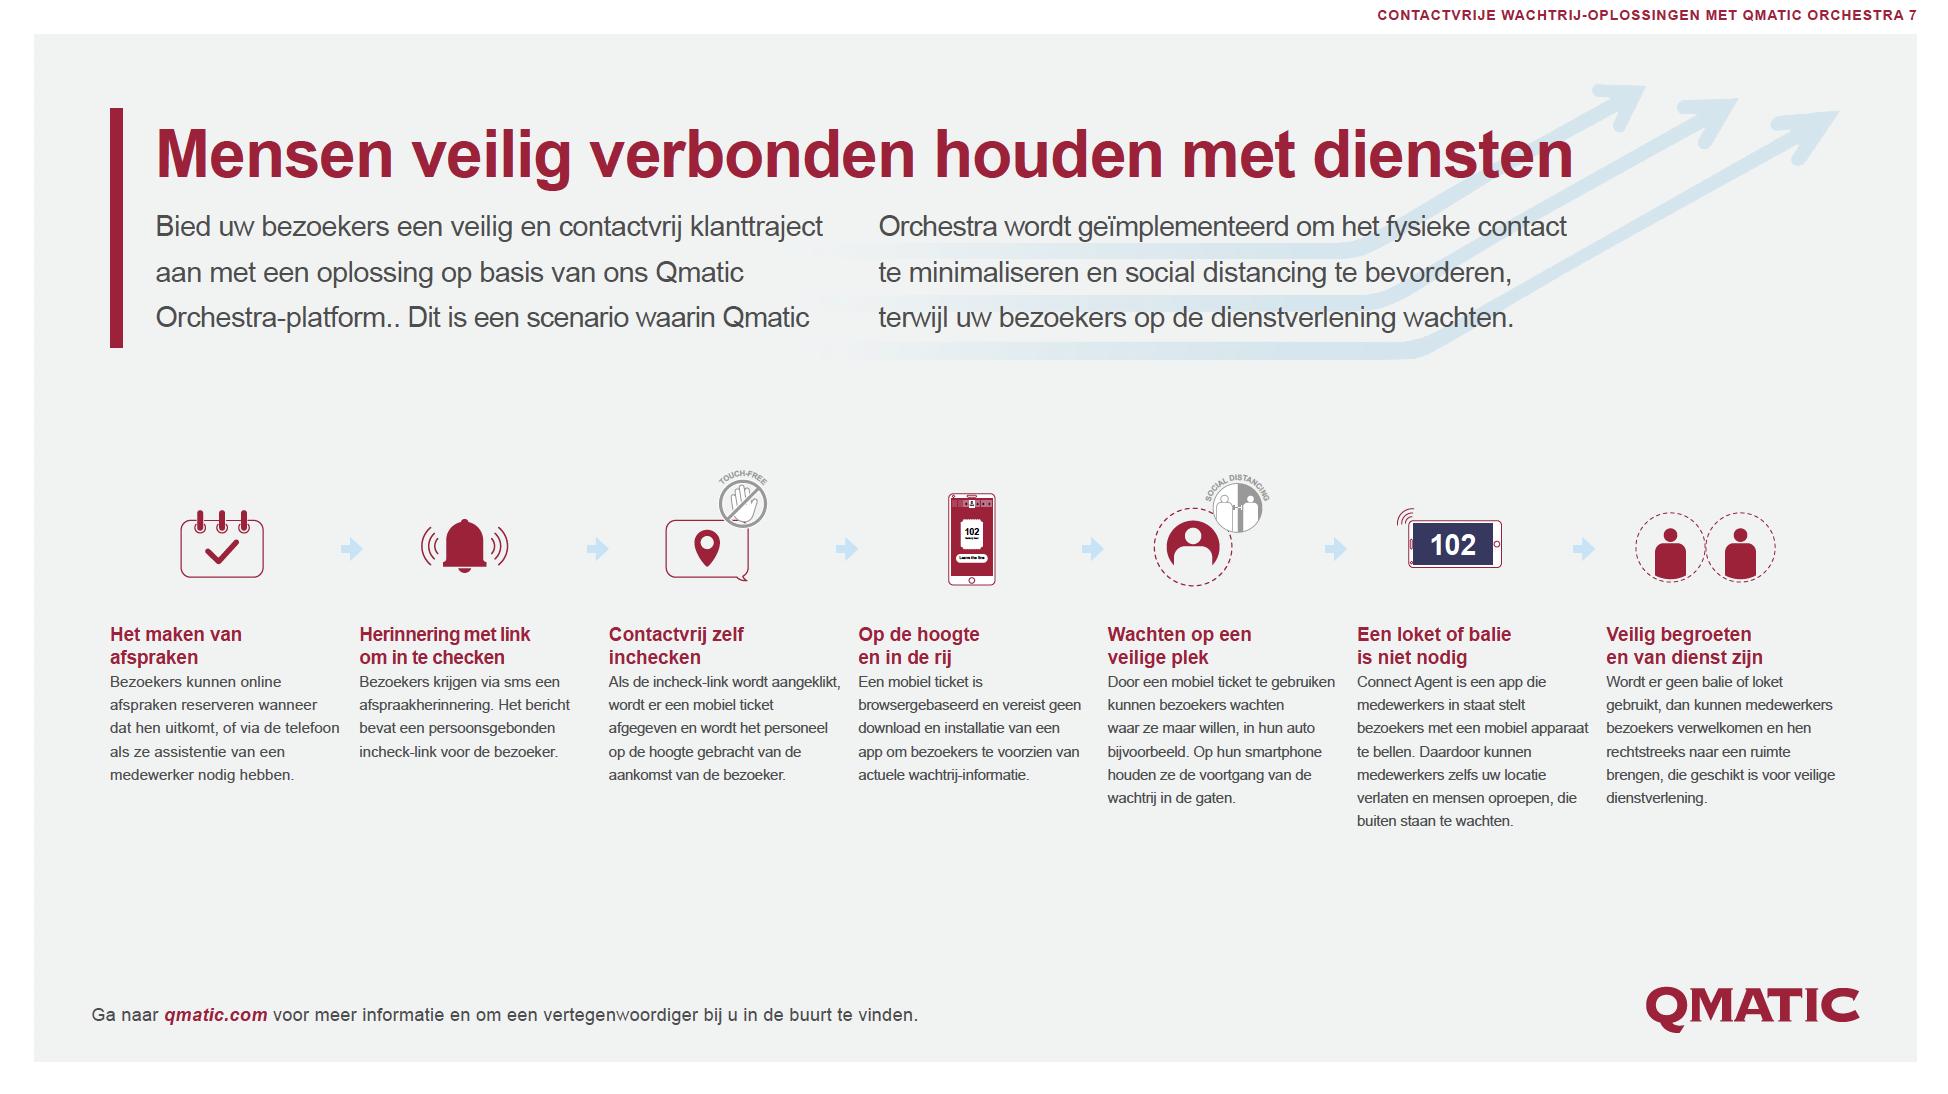 infographic-touchfree-cjm-social-image-nl